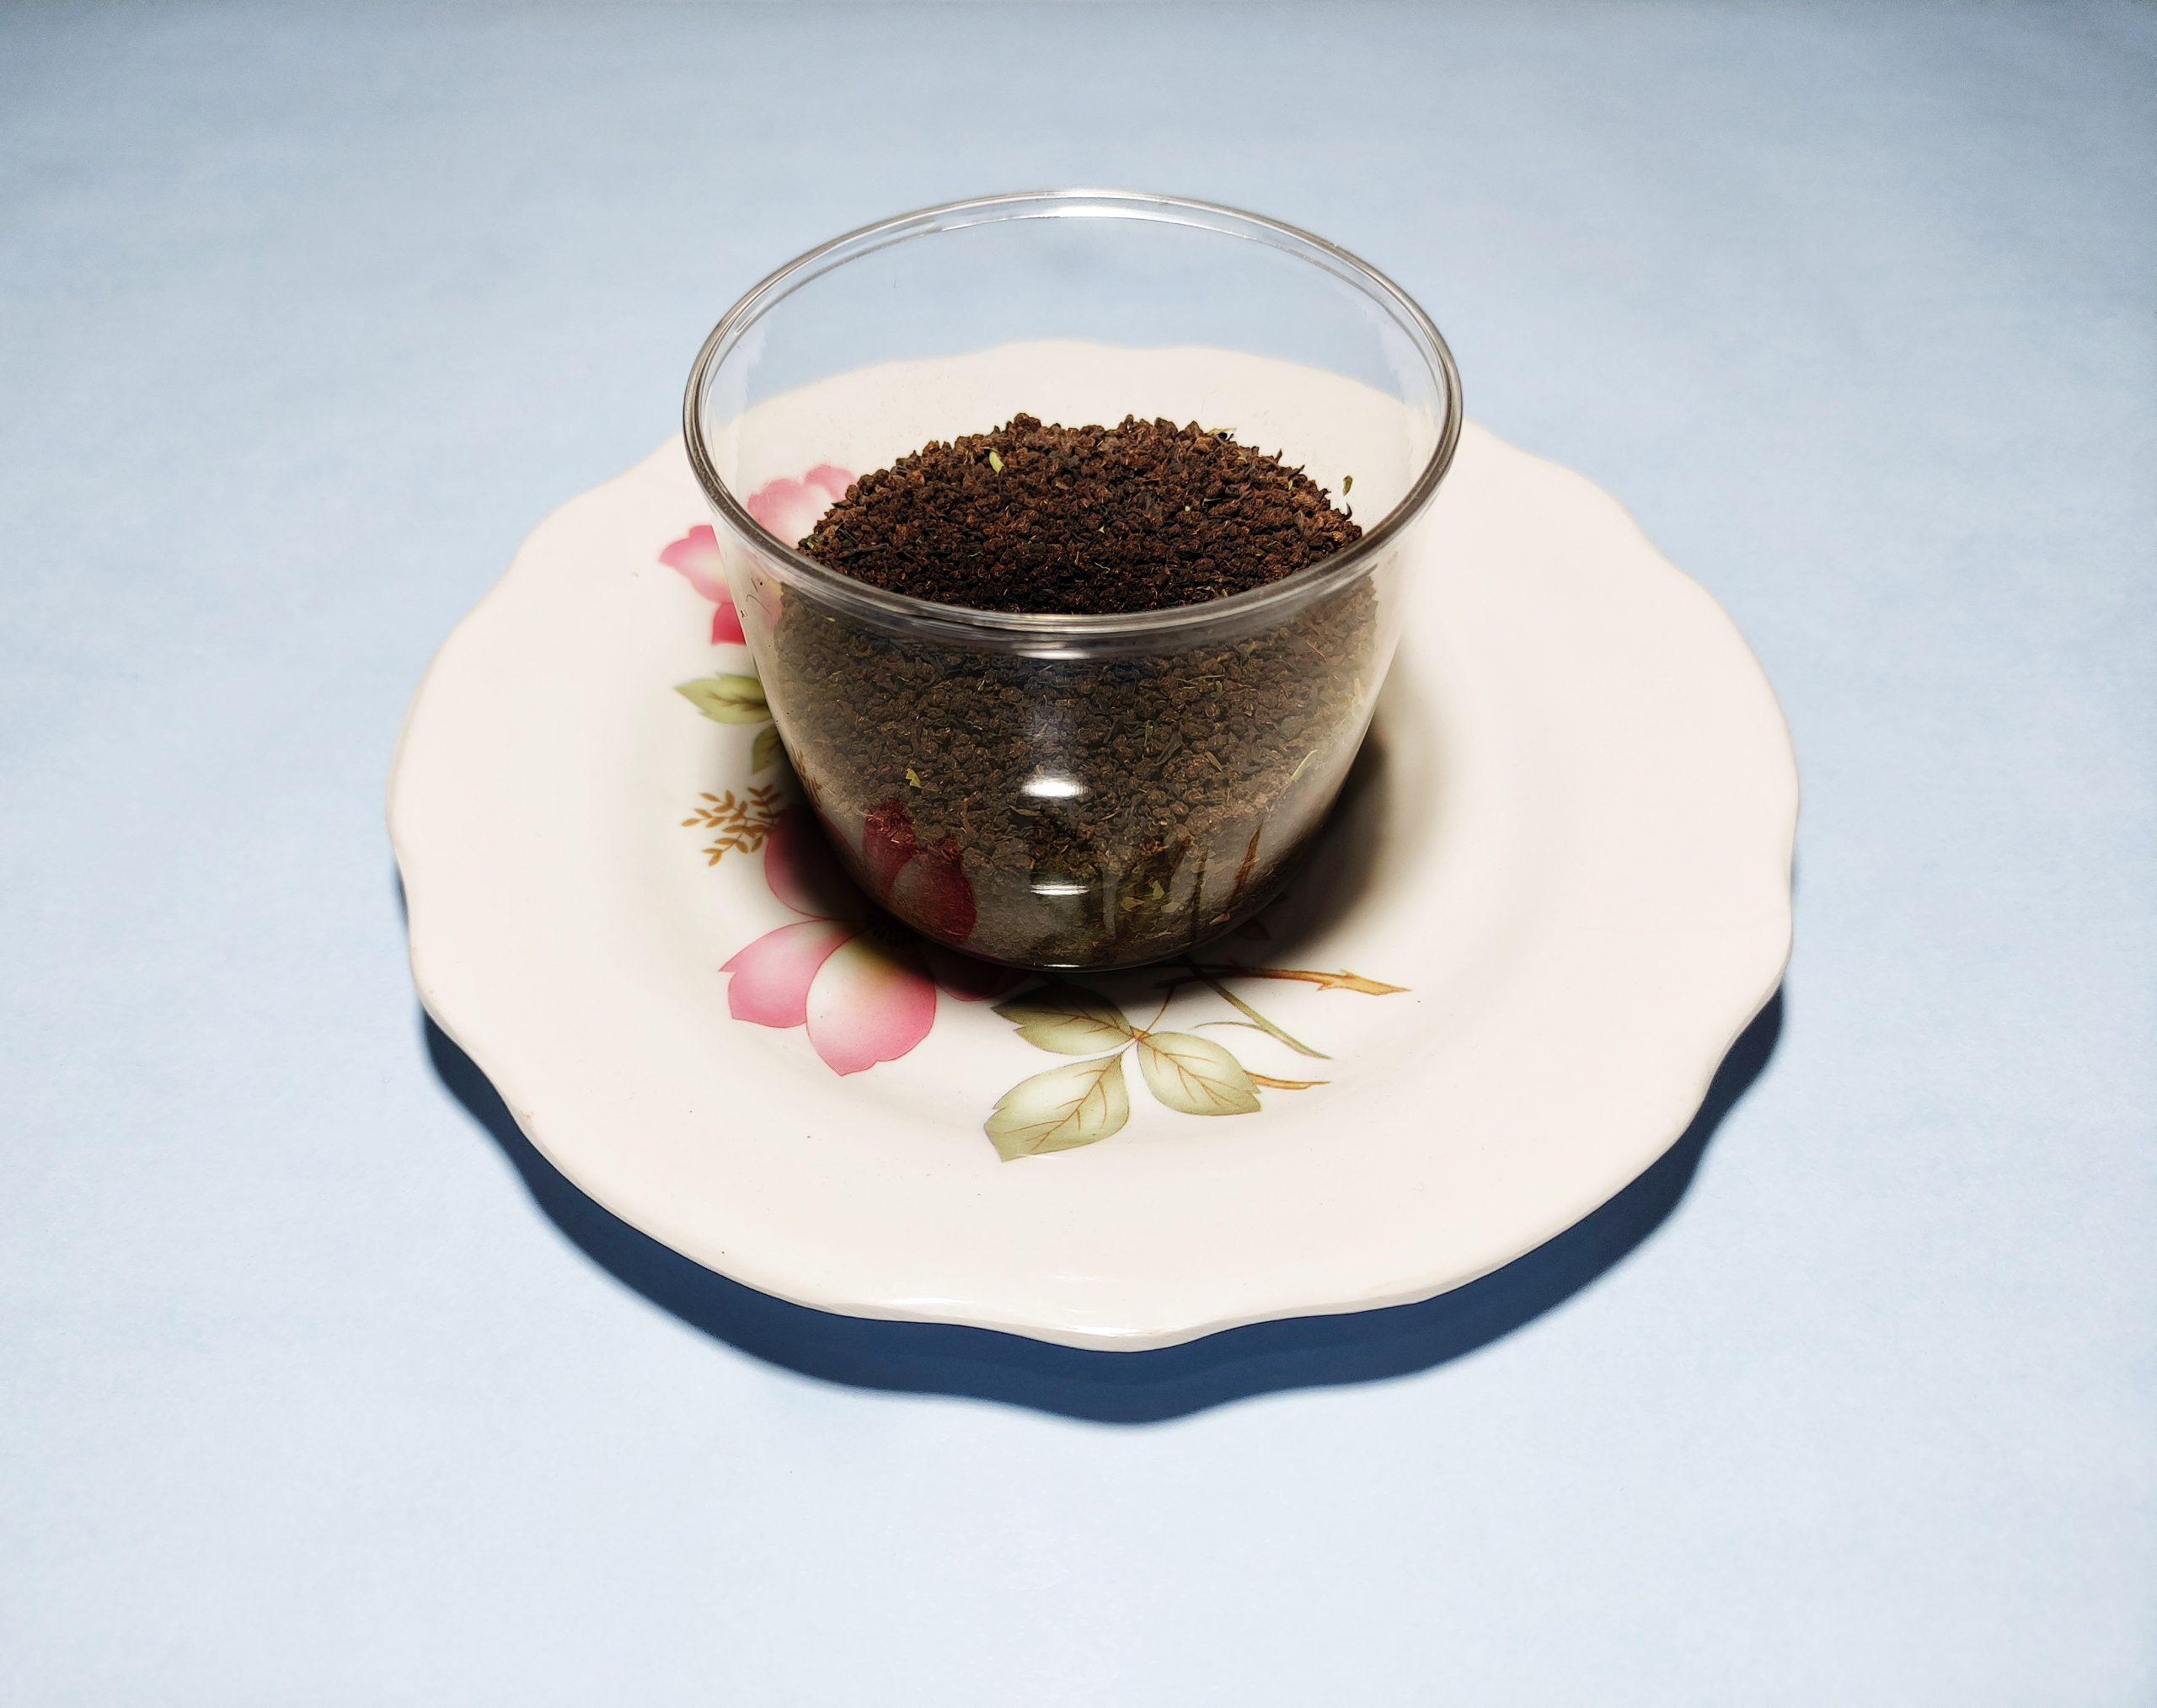 Tea leaves in a glass